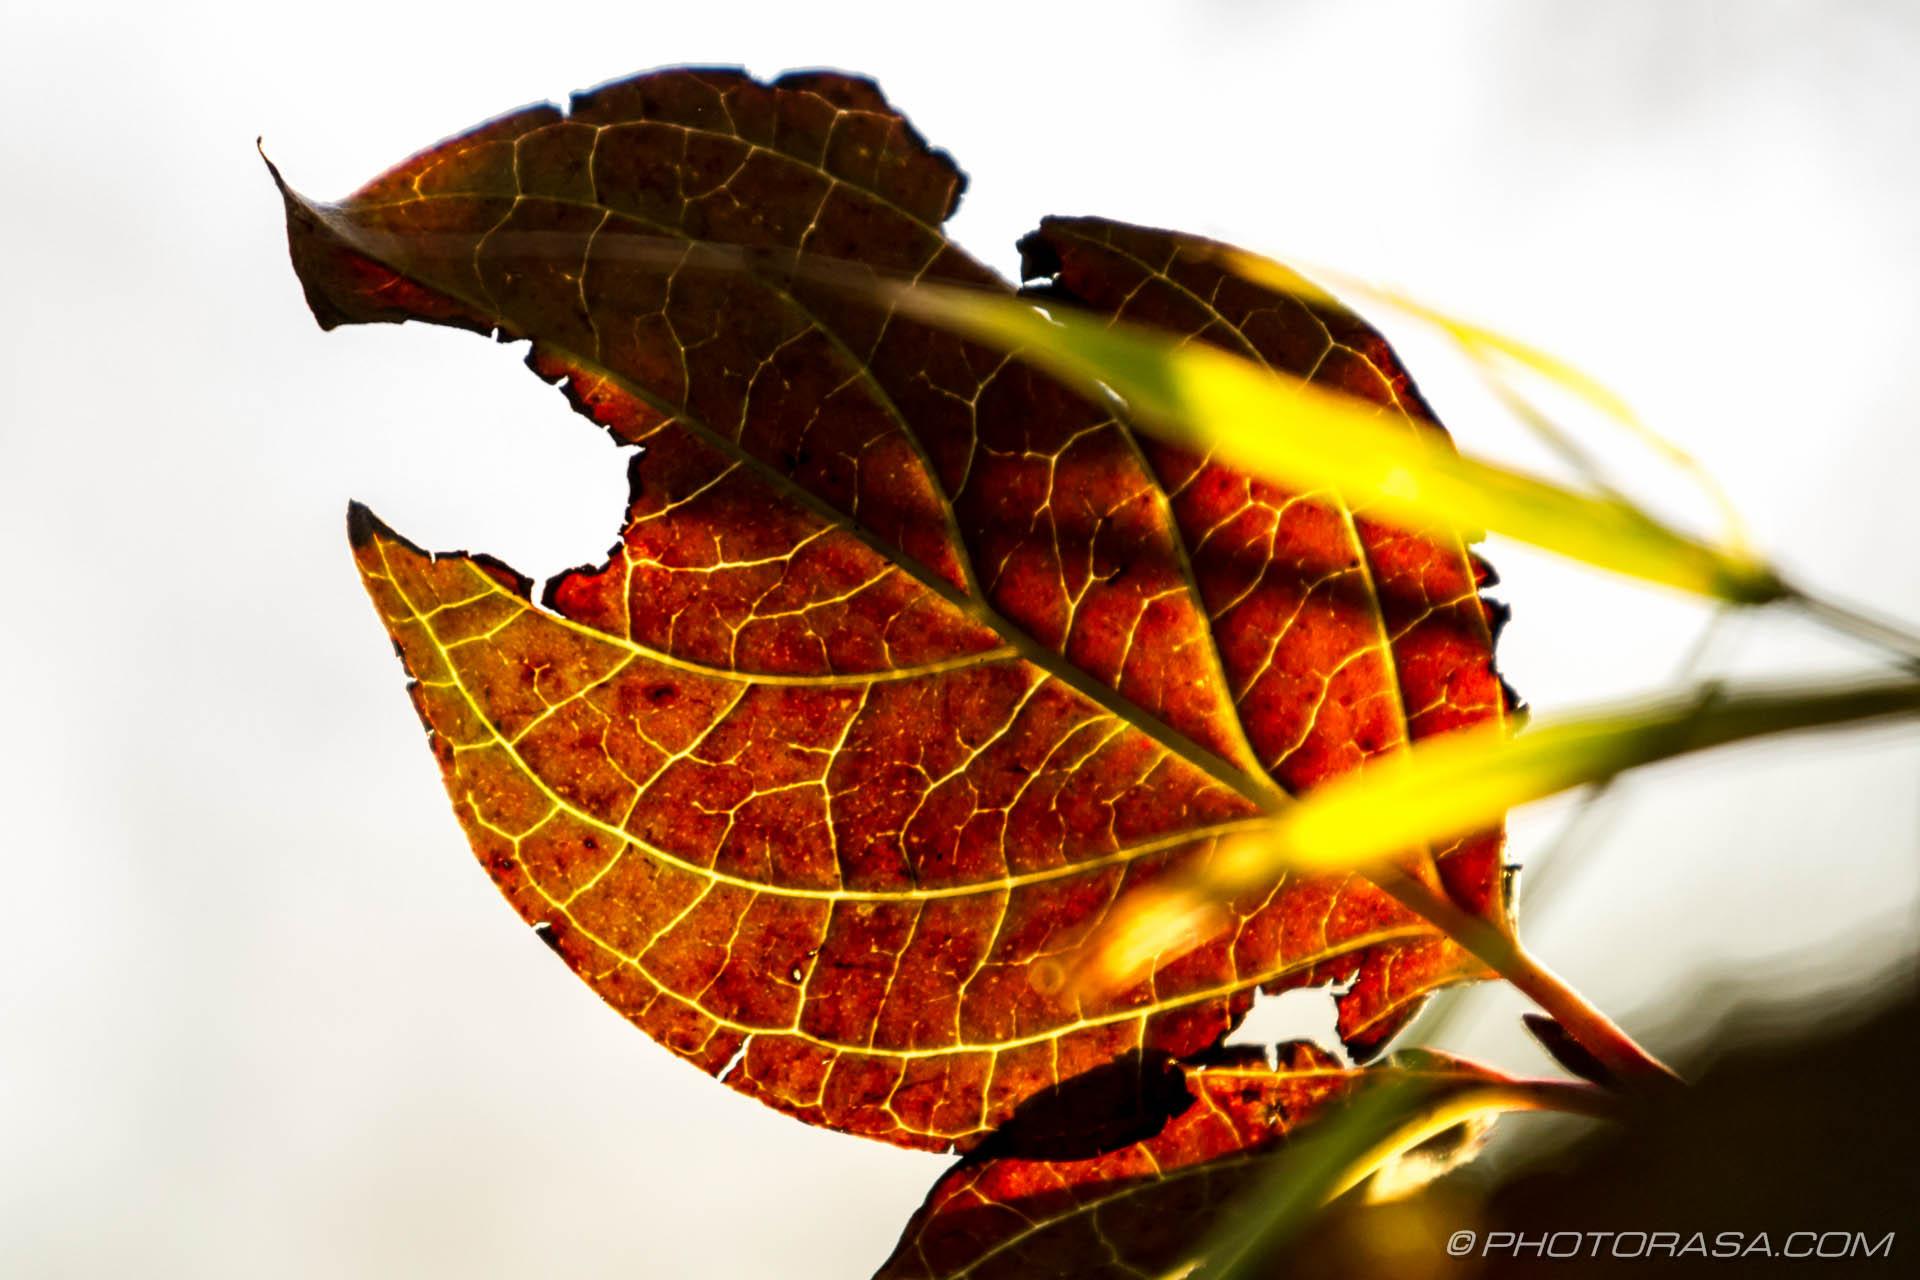 http://photorasa.com/autumn-leaves/damaged-brown-autumn-dogwood-leaf-at-sunset/